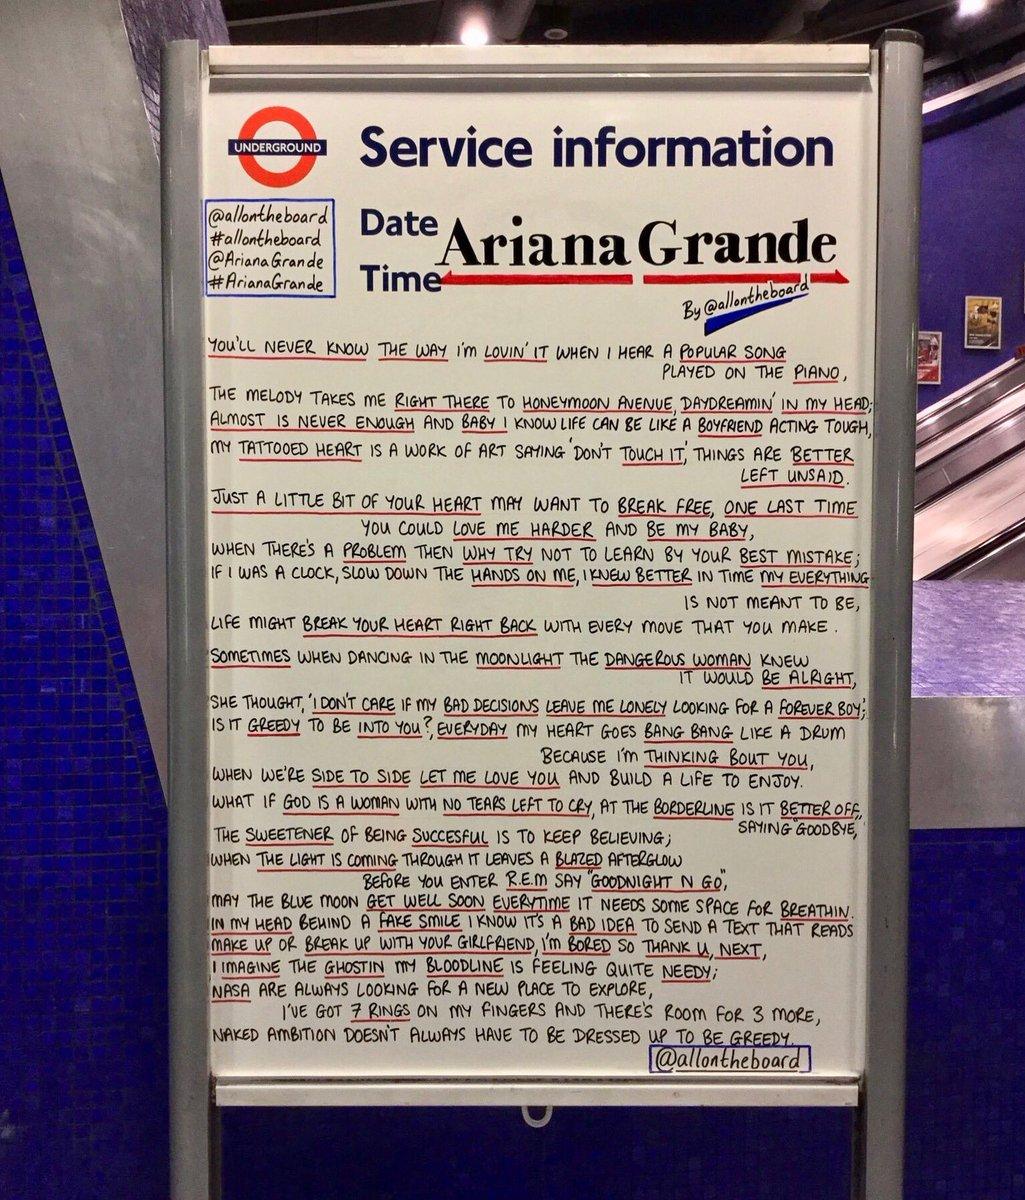 Happy 27th Birthday Ariana Grande. @allontheboard #HappyBirthdayAriana #HappyBirthdayArianaGrande #ArianaGrande @ArianaGrande #allontheboard